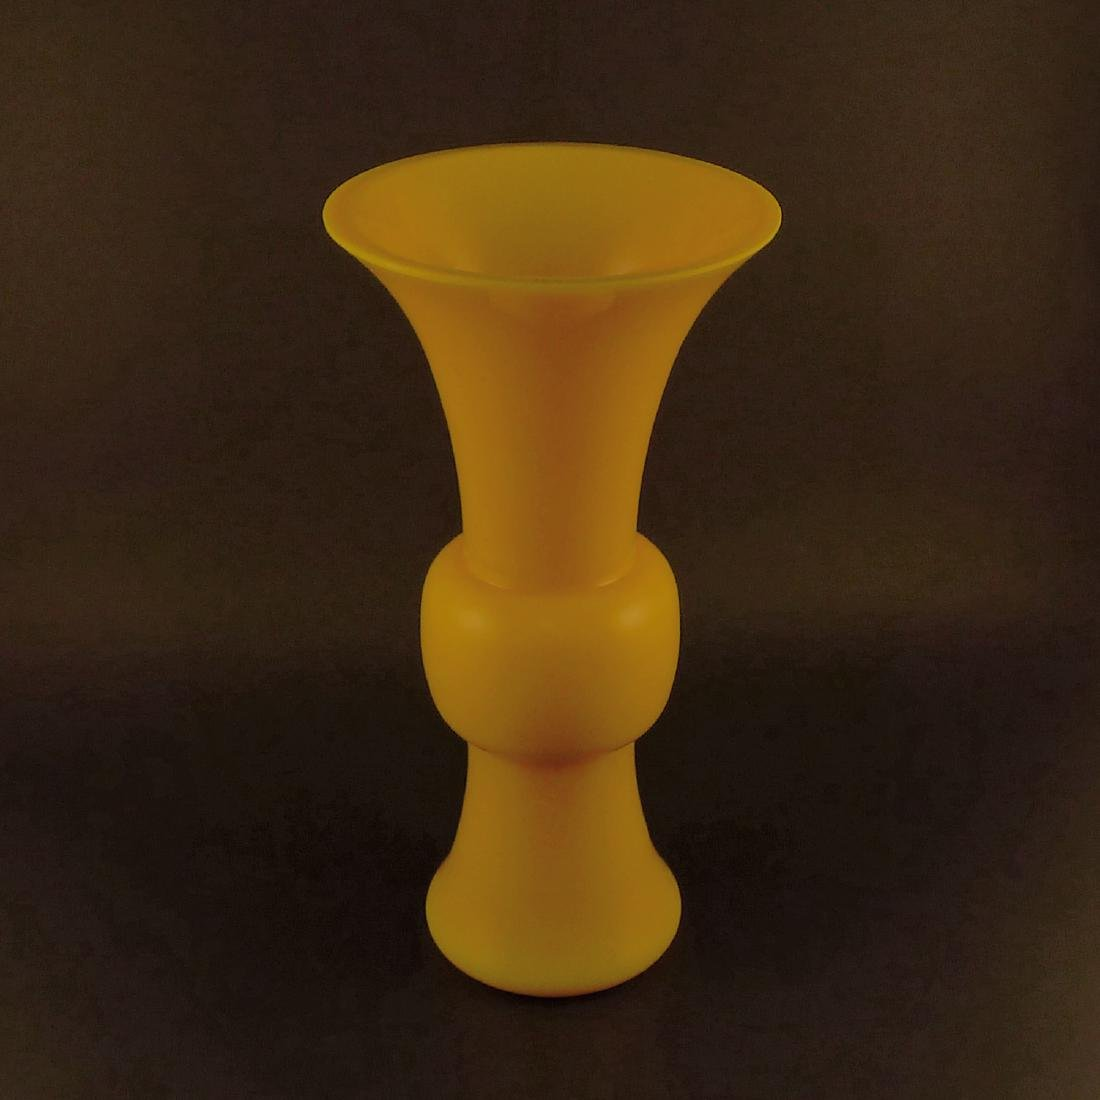 Old Beijing Yellow Glass Vase - 2